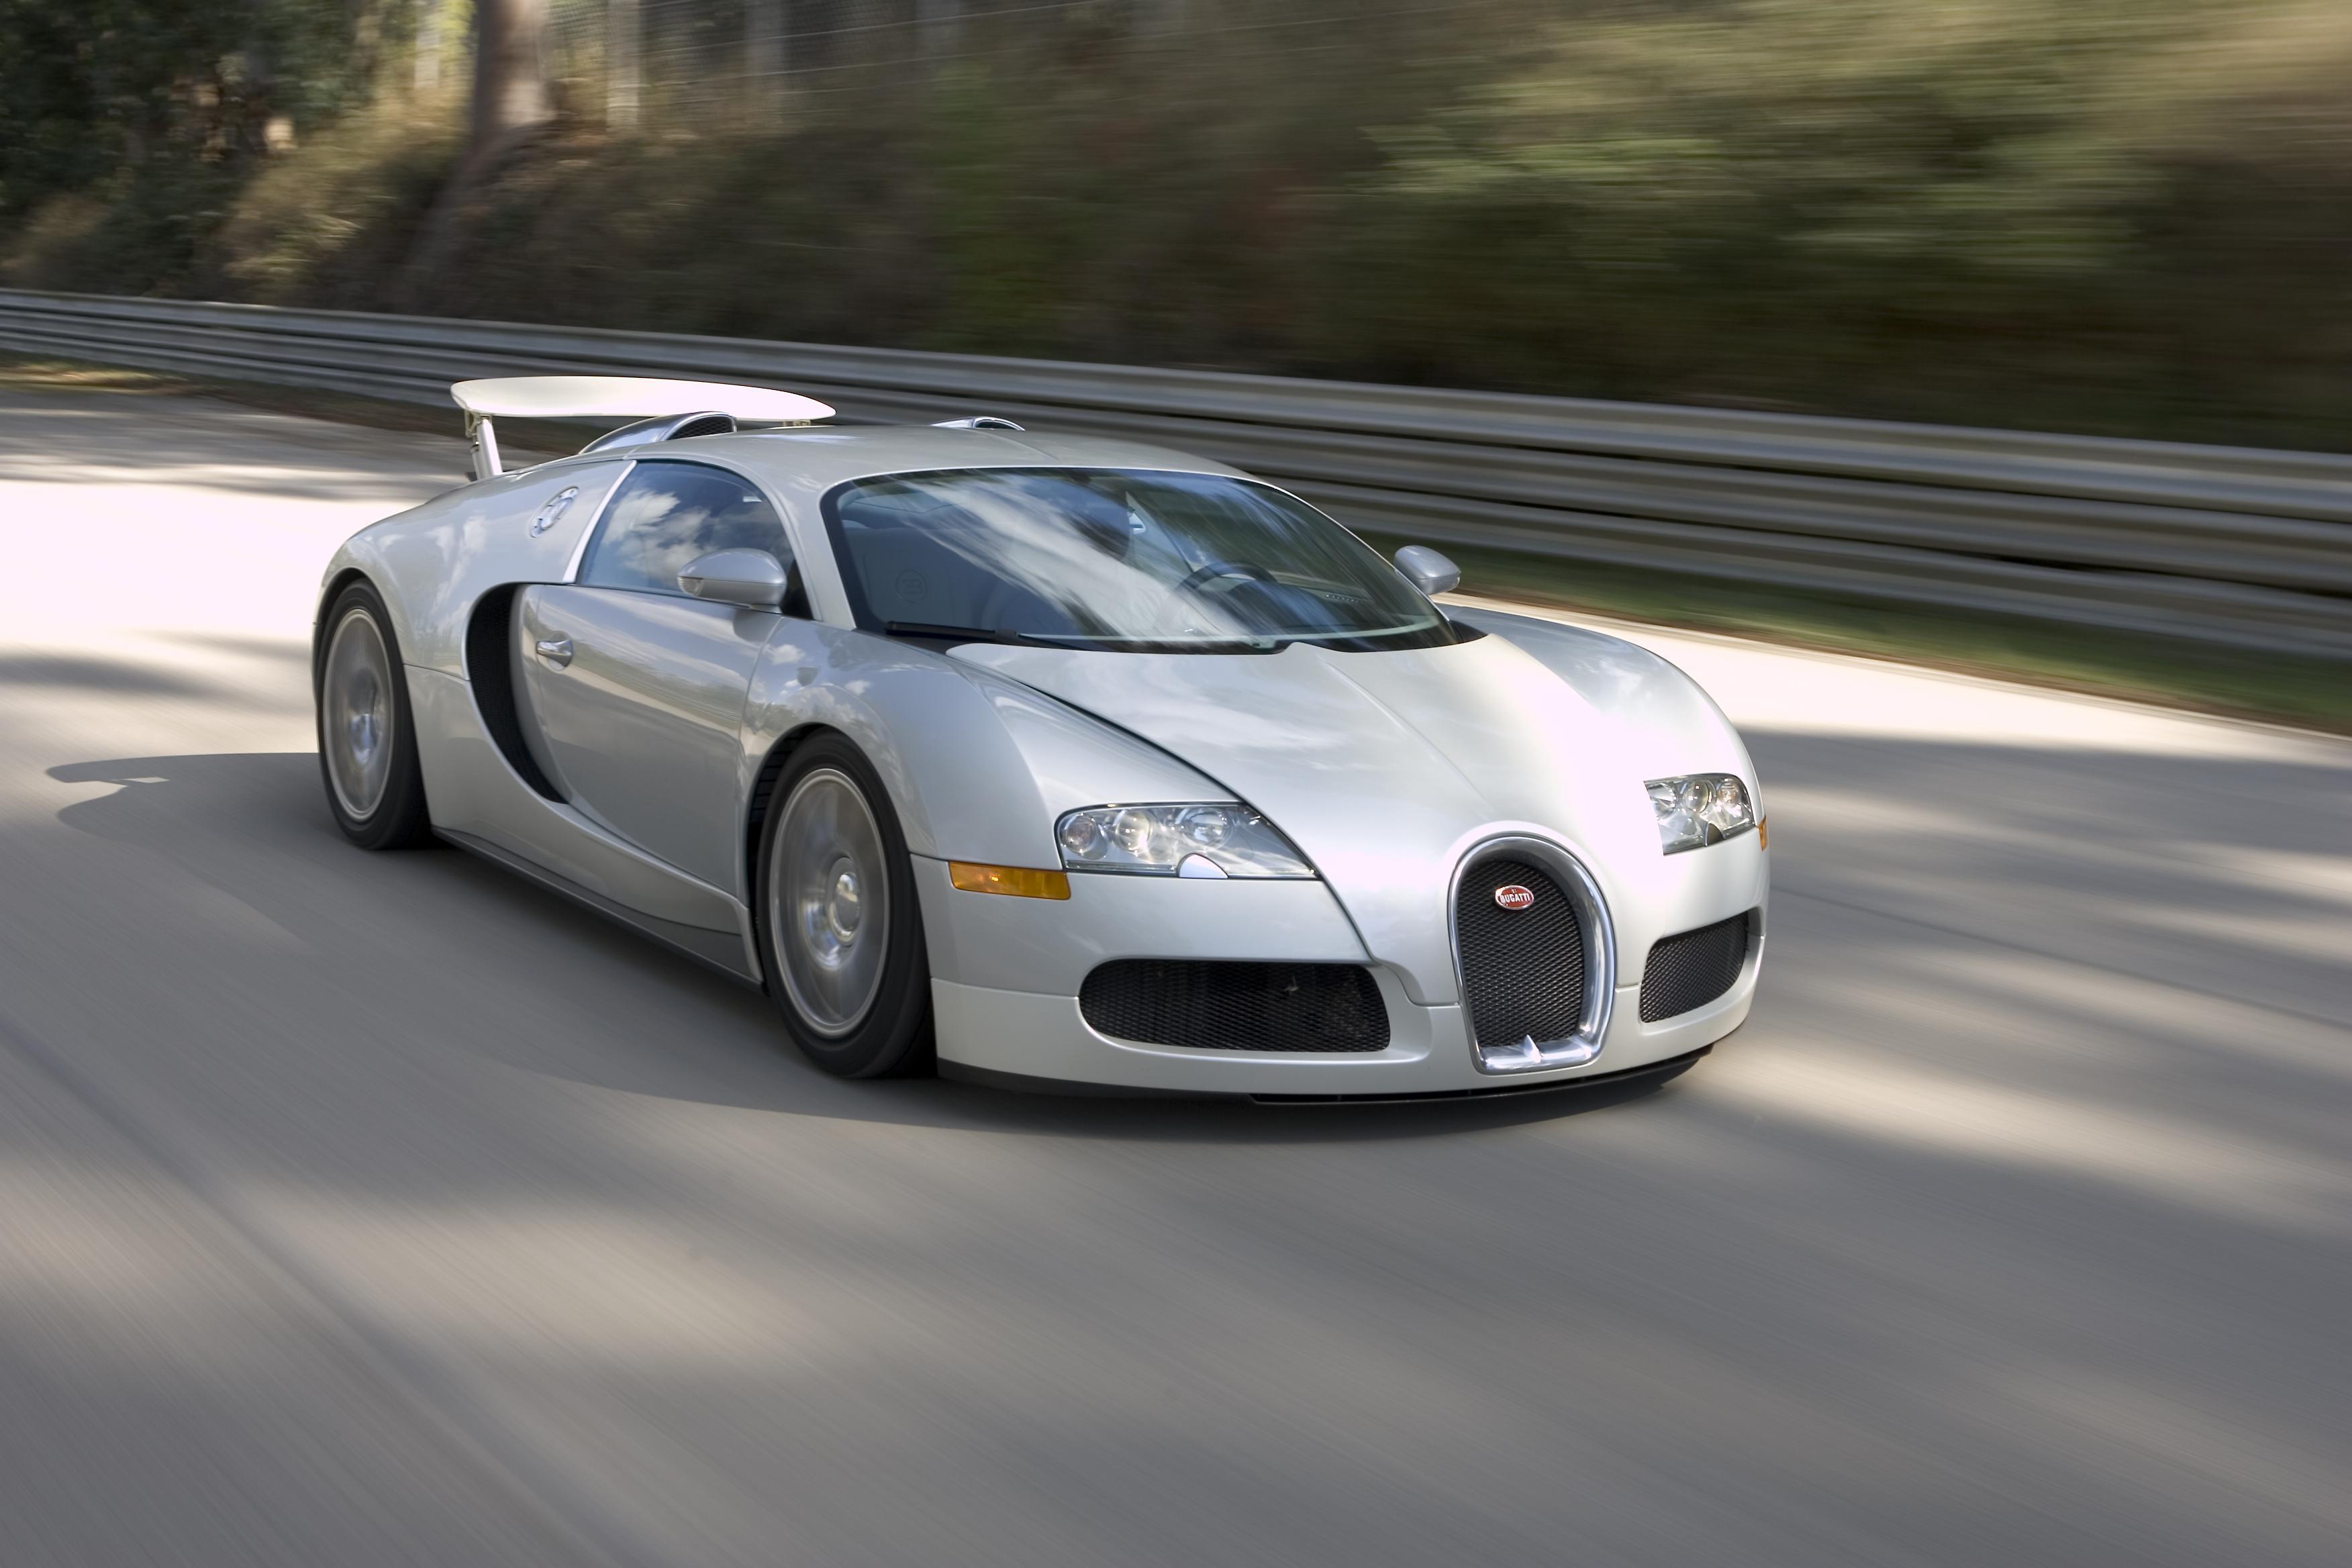 83029713 Wonderful Bugatti Veyron On Road Price Cars Trend